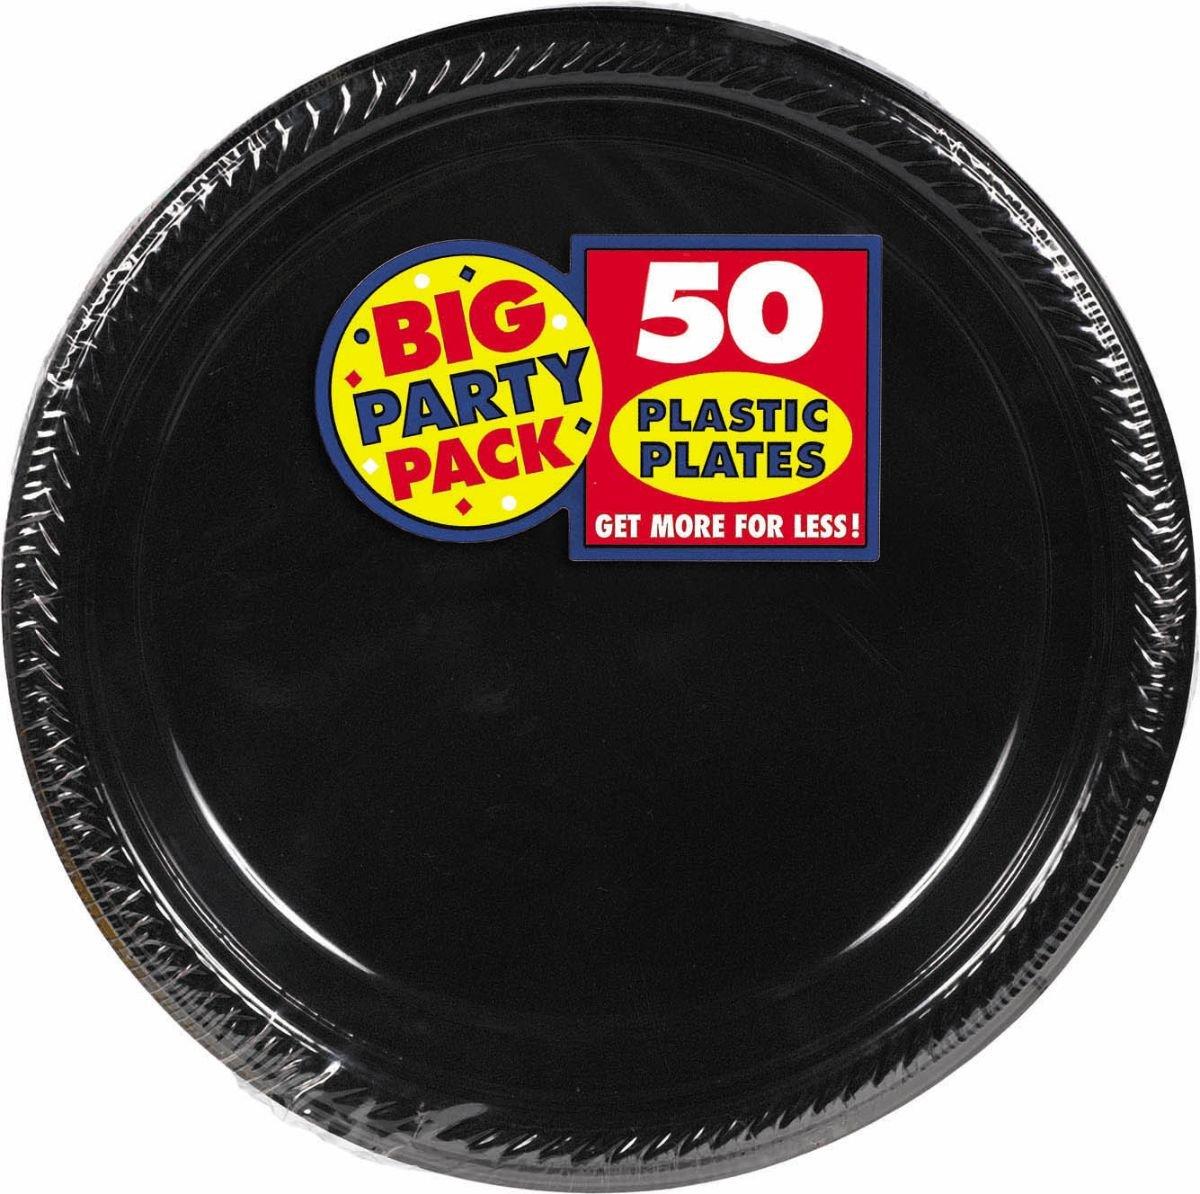 Amscan 630732.1 10 1/4'' Big Party Pack Plastic Plates, 50 Piece, Black